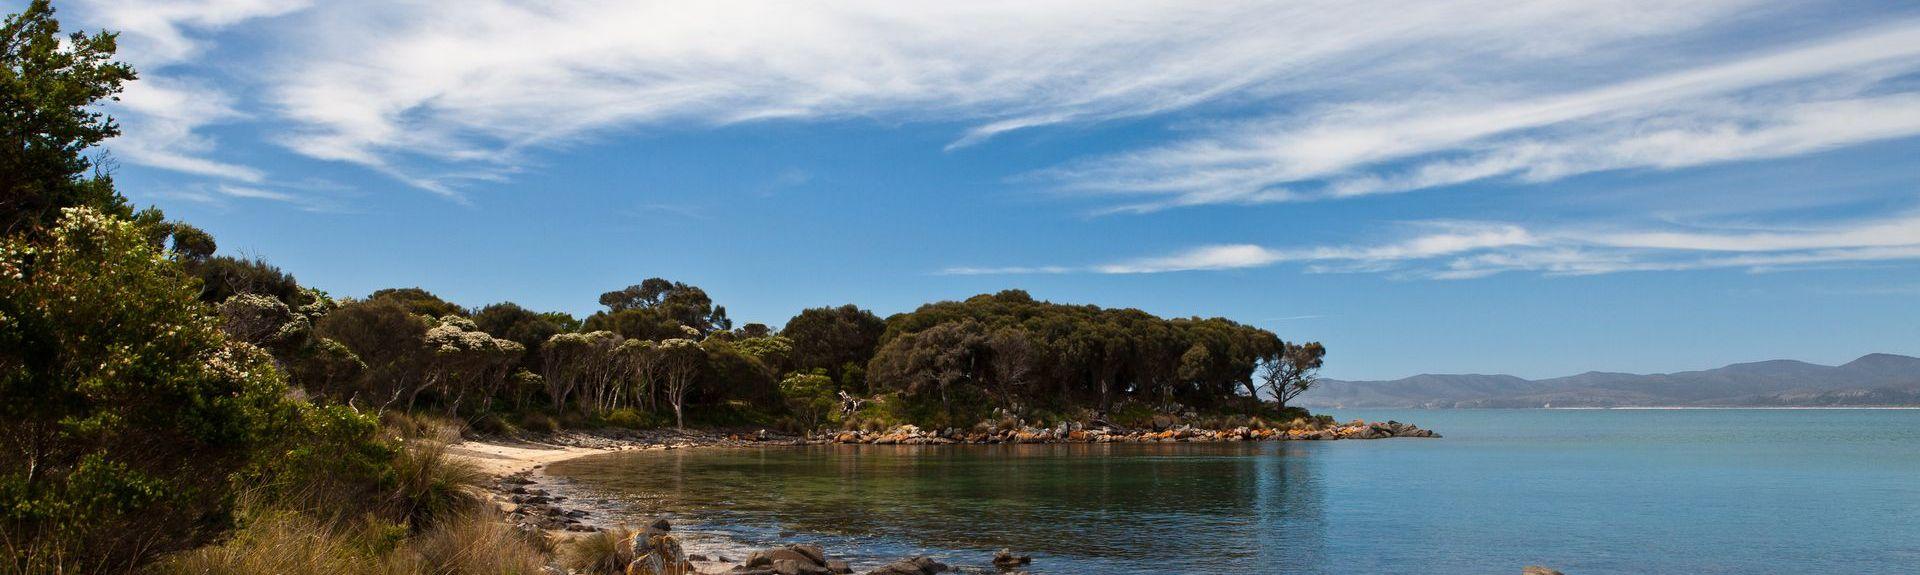 Hawley Beach, Tasmania, Australia